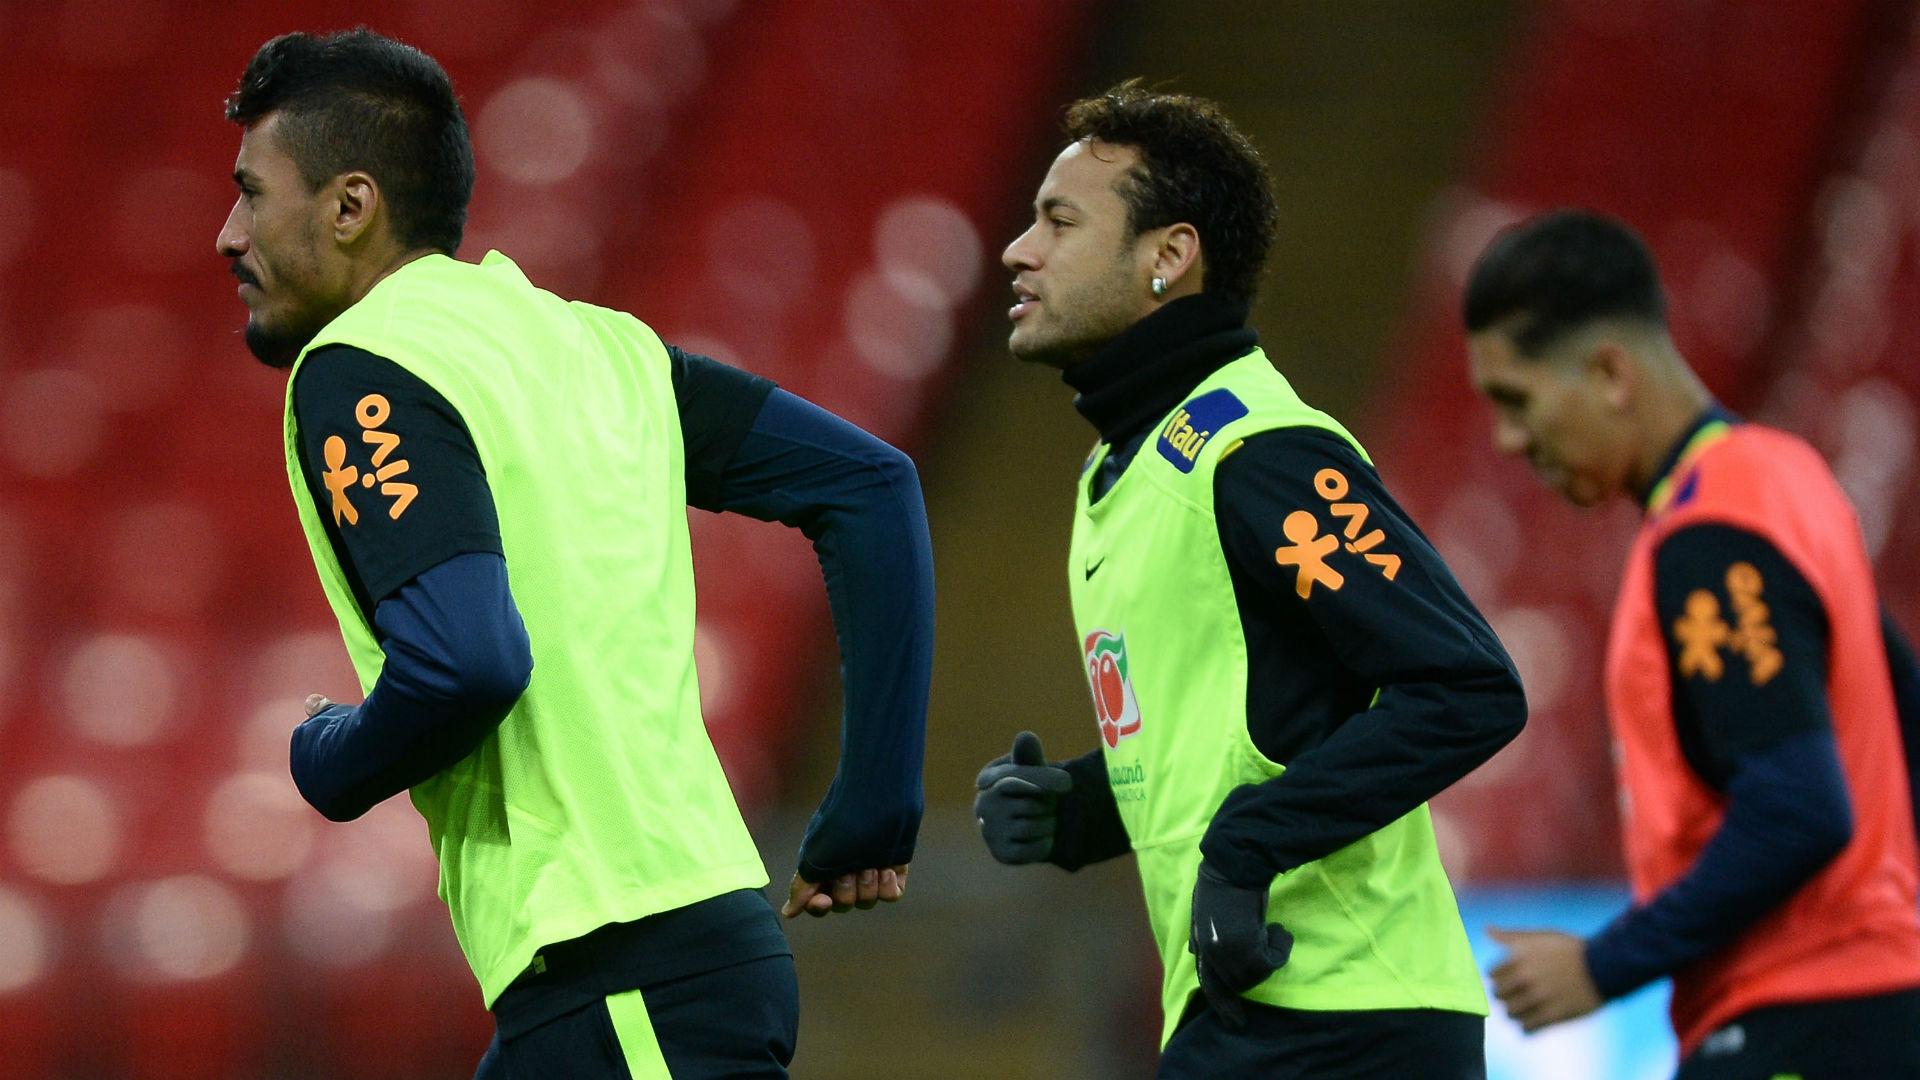 Paulinho Neymar treino Seleção Brasil Wembley 13 11 2017